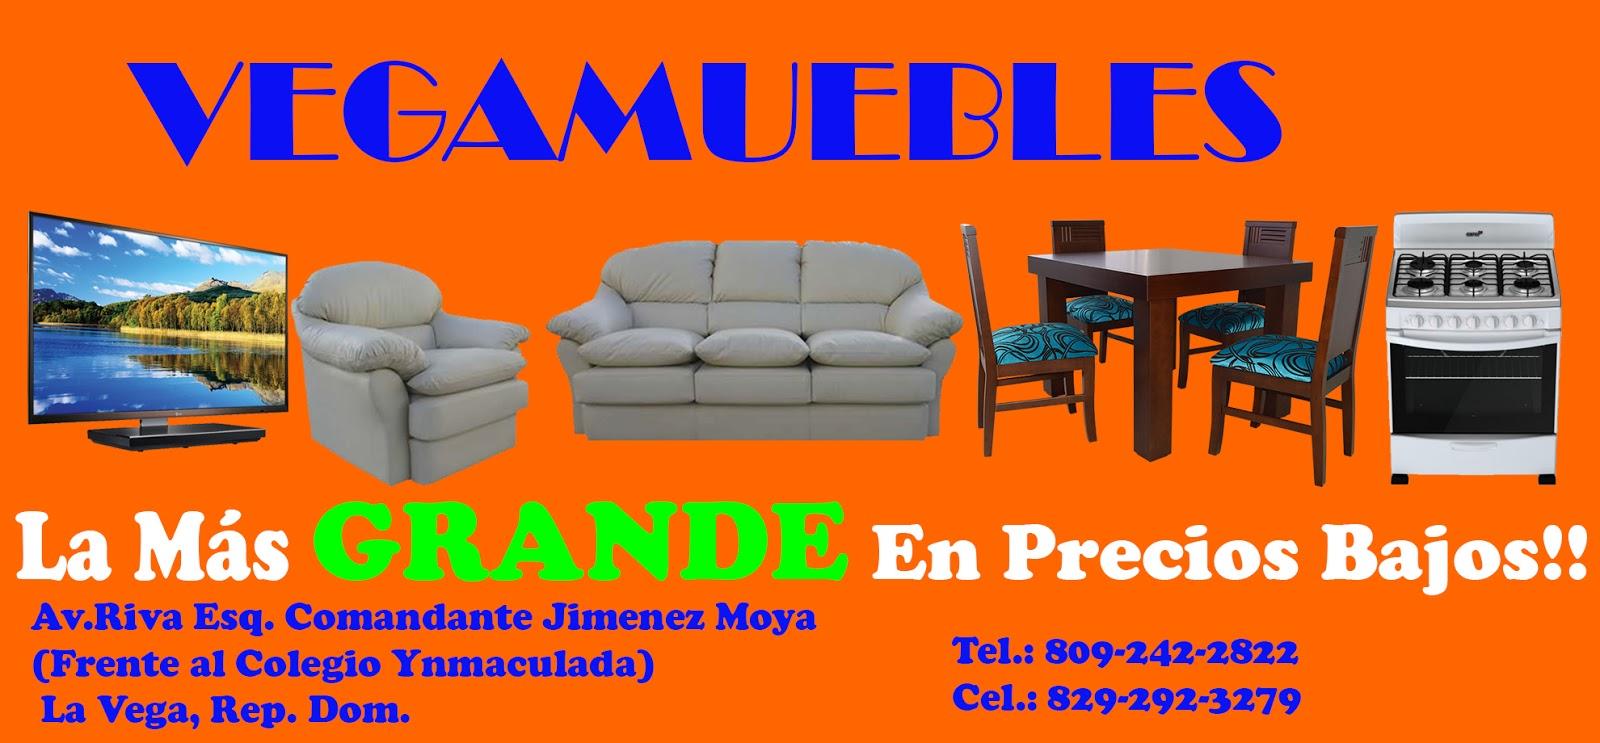 Muebles En Nagua Republica Dominicana - 10 10 16 An Lisis Con Carlos Fern Ndez[mjhdah]https://http2.mlstatic.com/juego-de-2-muebles-para-sala-D_NQ_NP_210515-MRD25263384111_012017-F.jpg